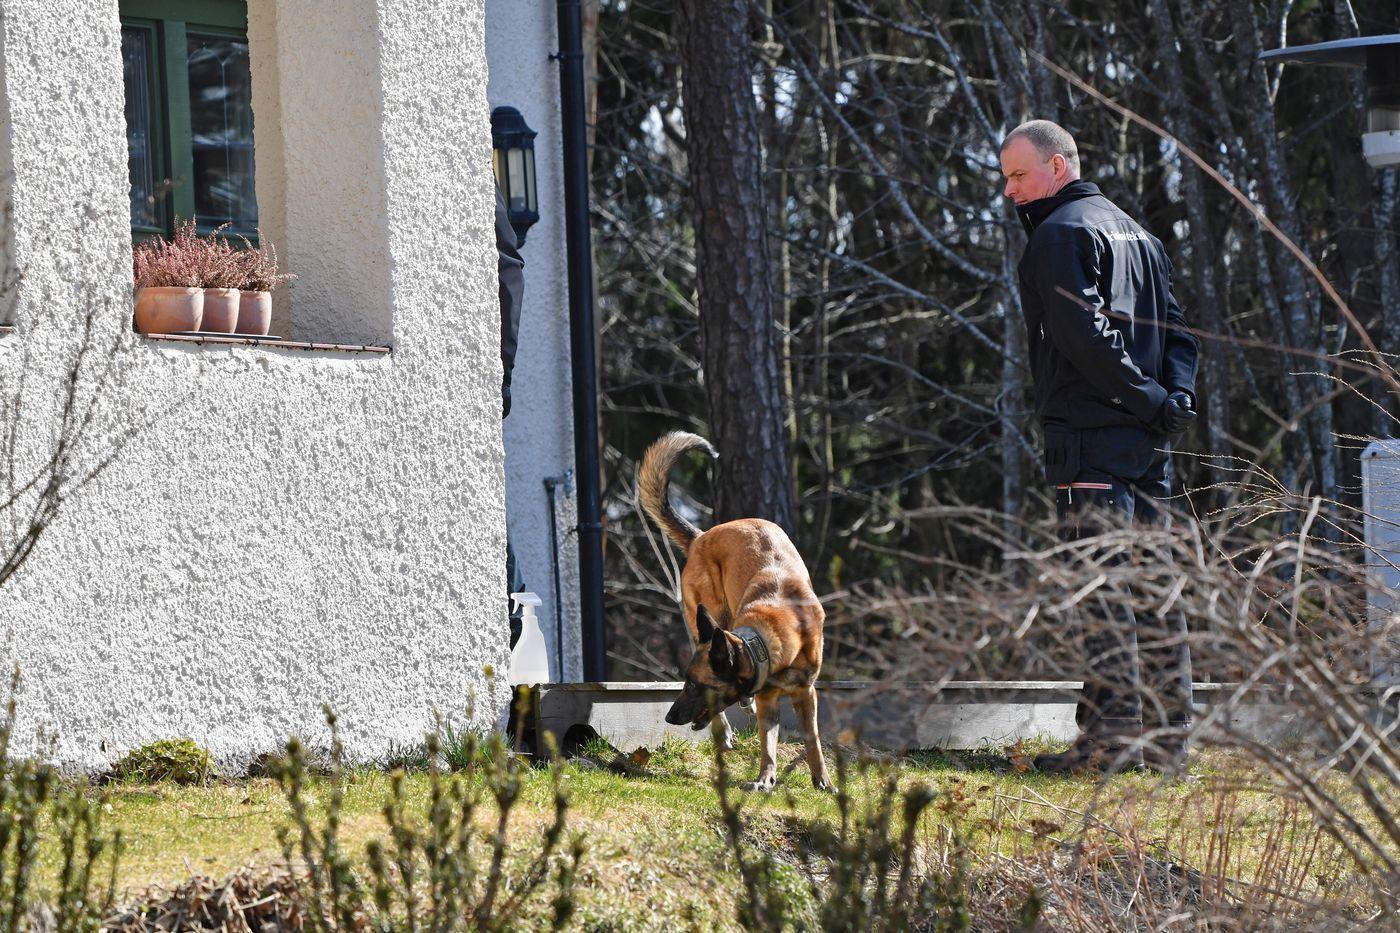 UNDERSØKELSER: Politiet gjorde nye søk ved eneboligen i Sloraveien i april.